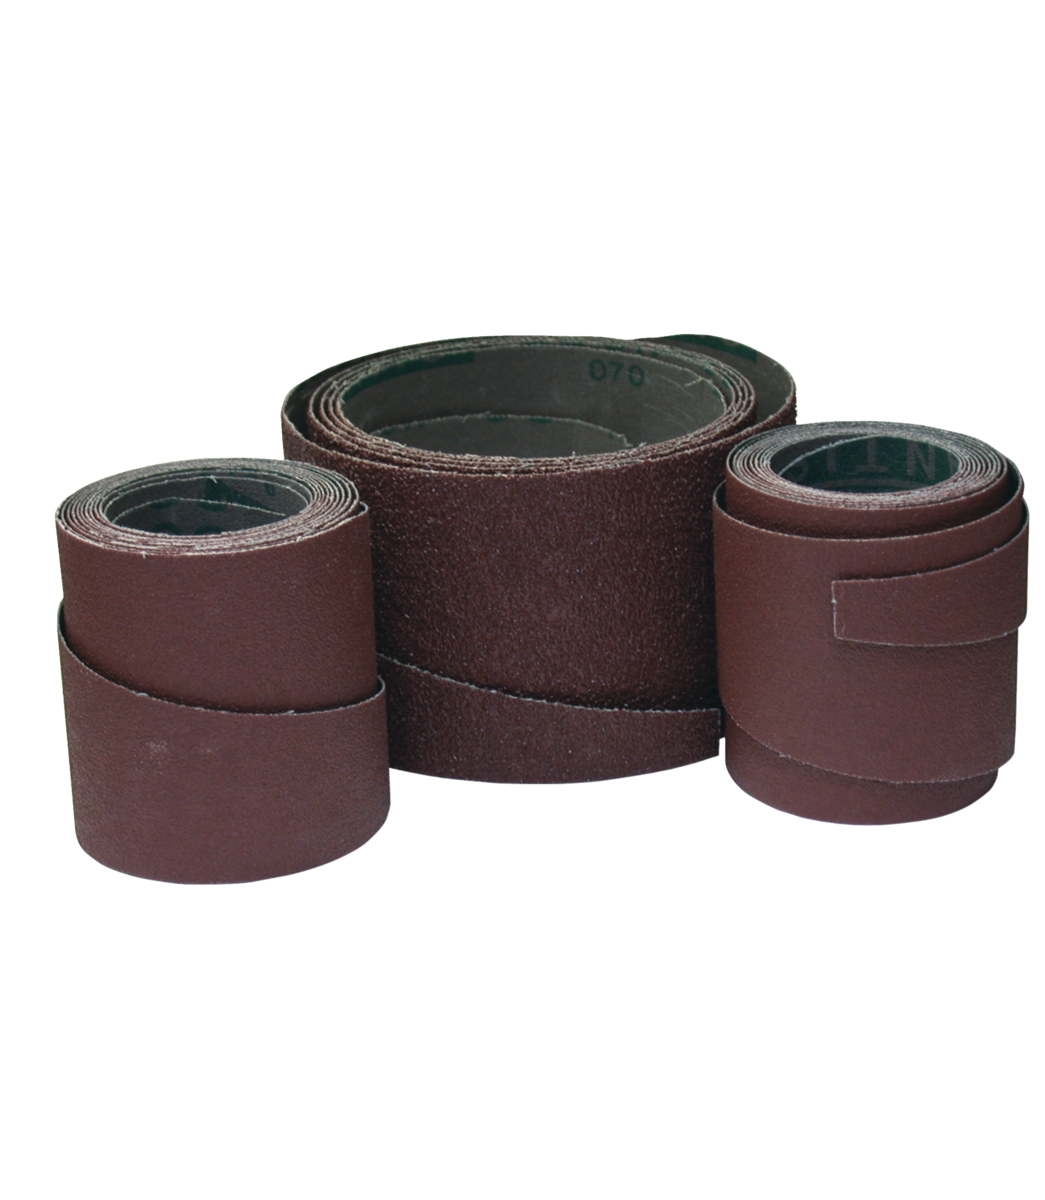 PM2244 Precut Abrasive, 120 Grit - 3 Pack